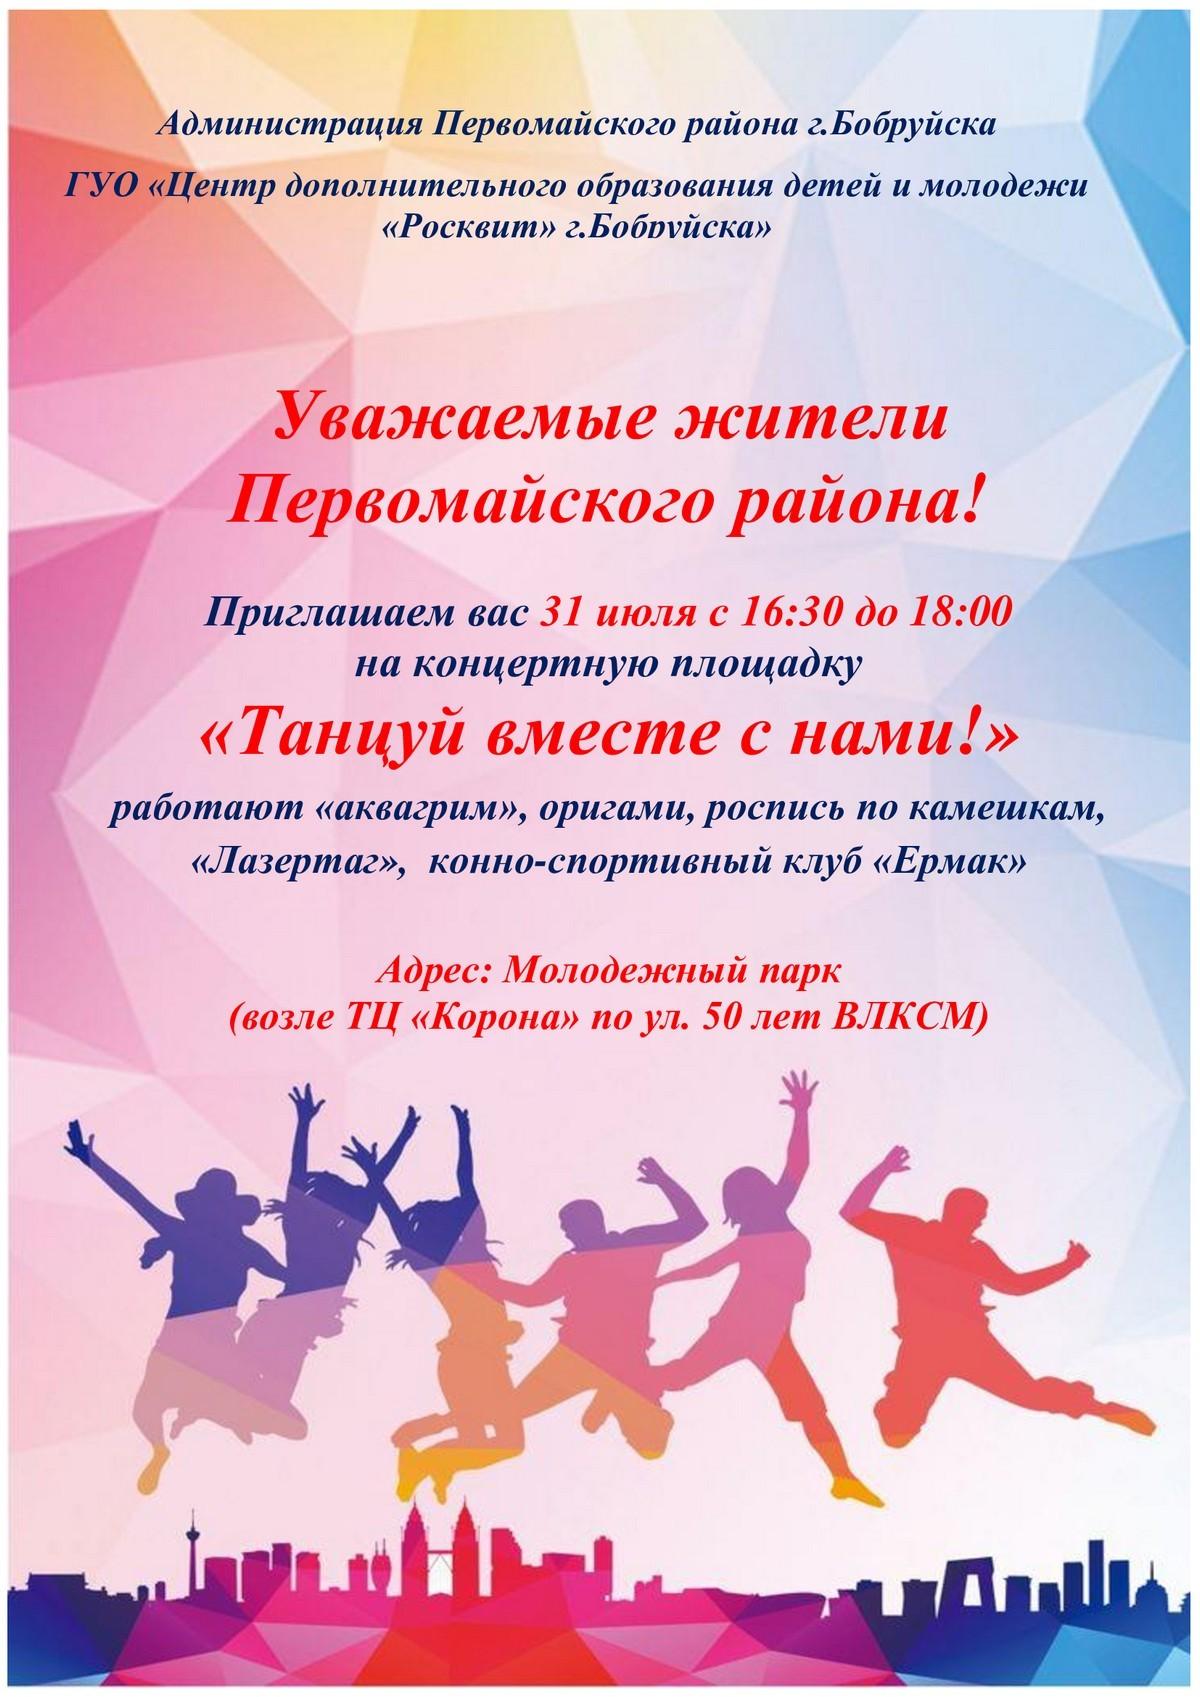 «Танцуй вместе с нами!»